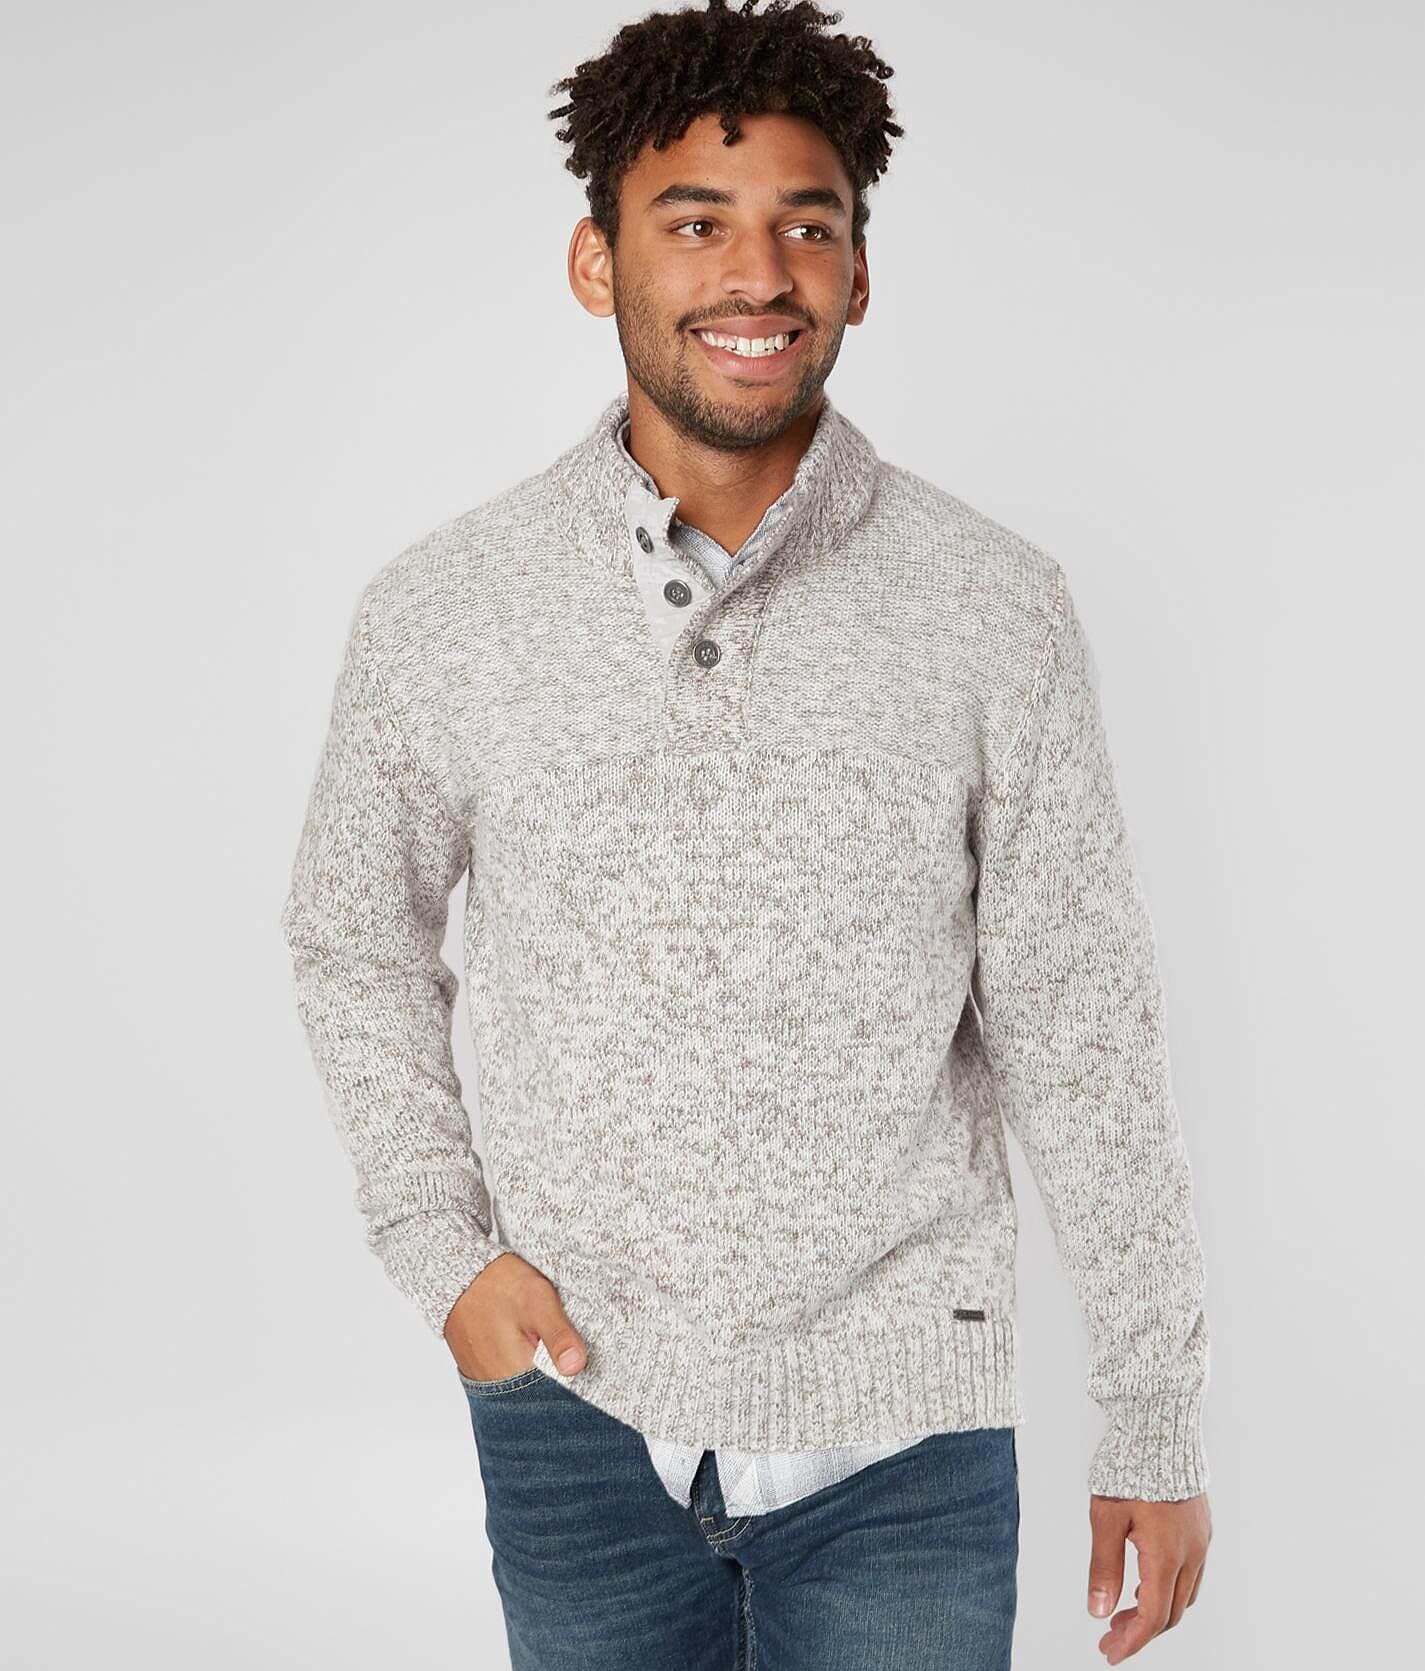 Jb Holt Mischief Henley Sweater Mens Sweaters In Cream Buckle